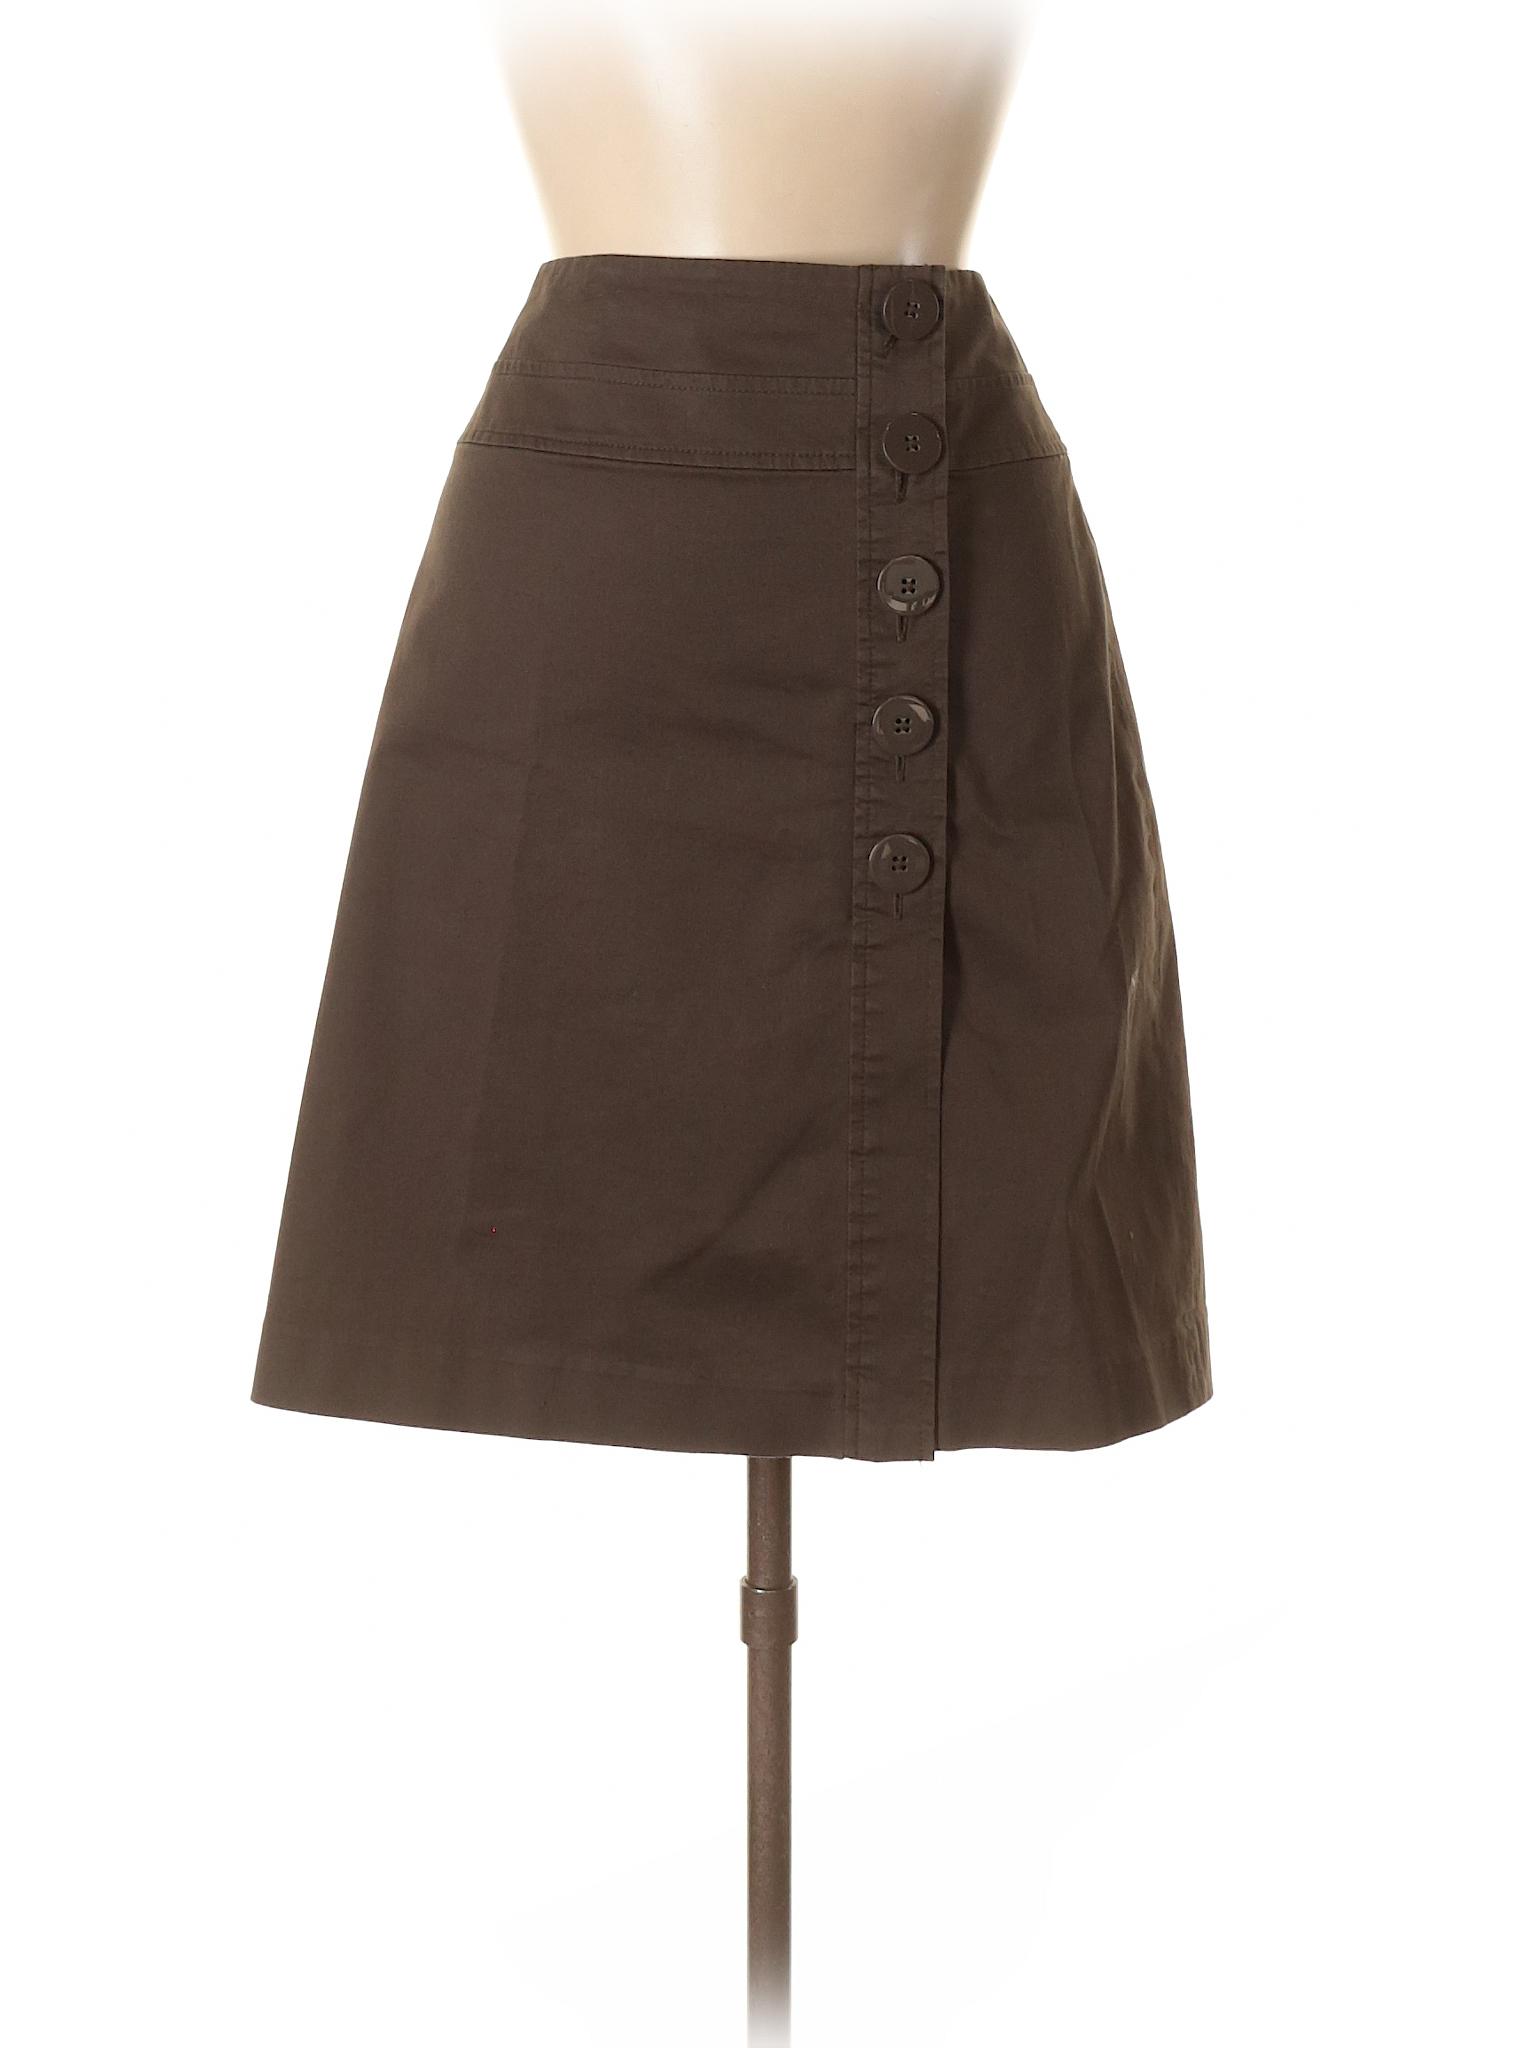 Talbots Casual Skirt Boutique Casual Skirt Talbots Boutique Talbots Boutique Casual Casual Skirt Boutique Boutique Talbots Casual Skirt Talbots Cq8n4B